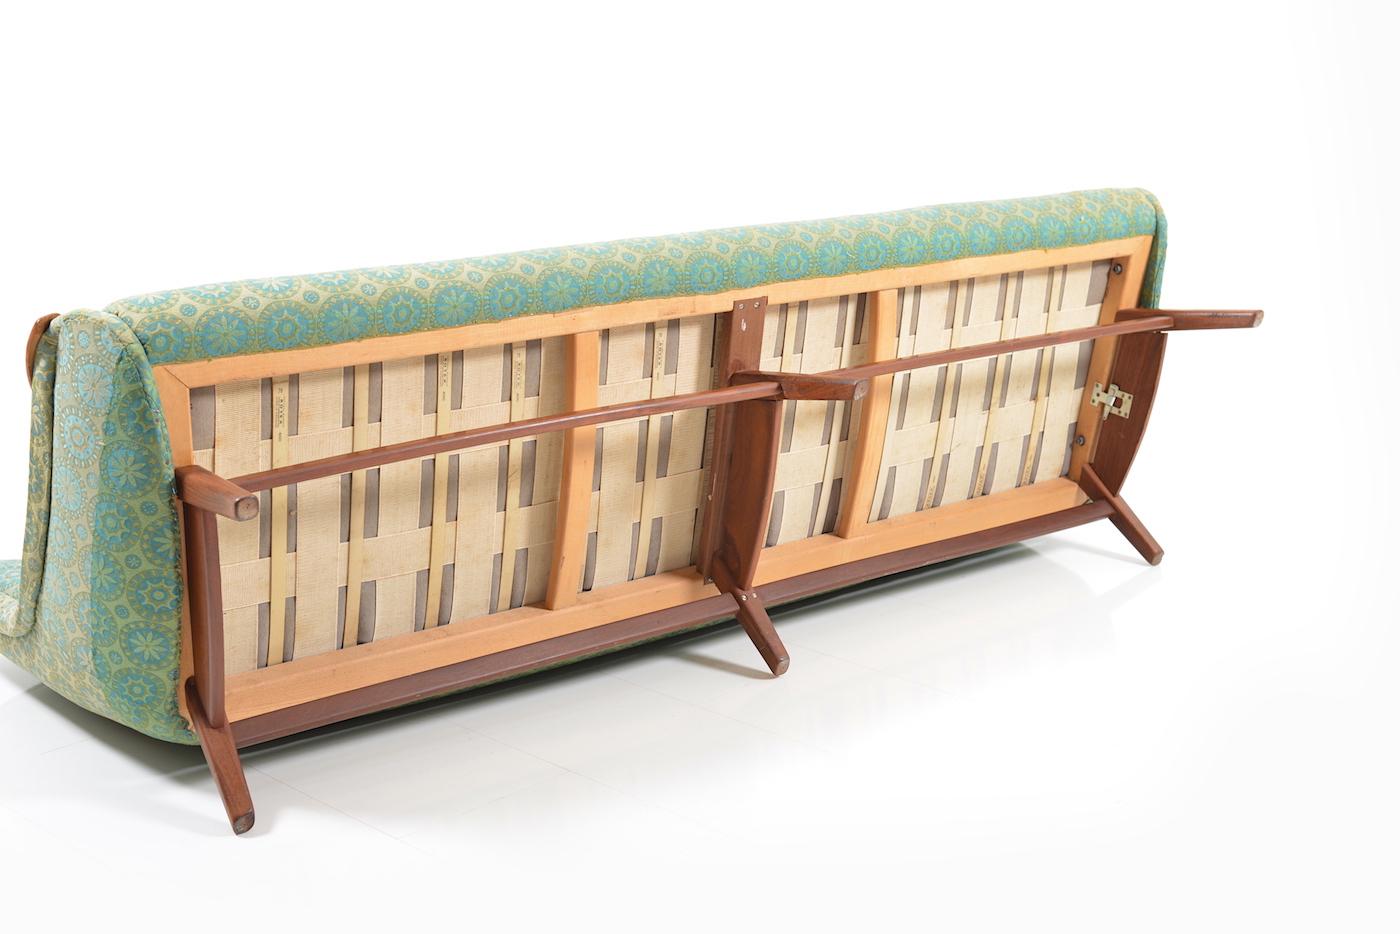 Prototype sofa by svend skipper room of art for Sofa set designer collection